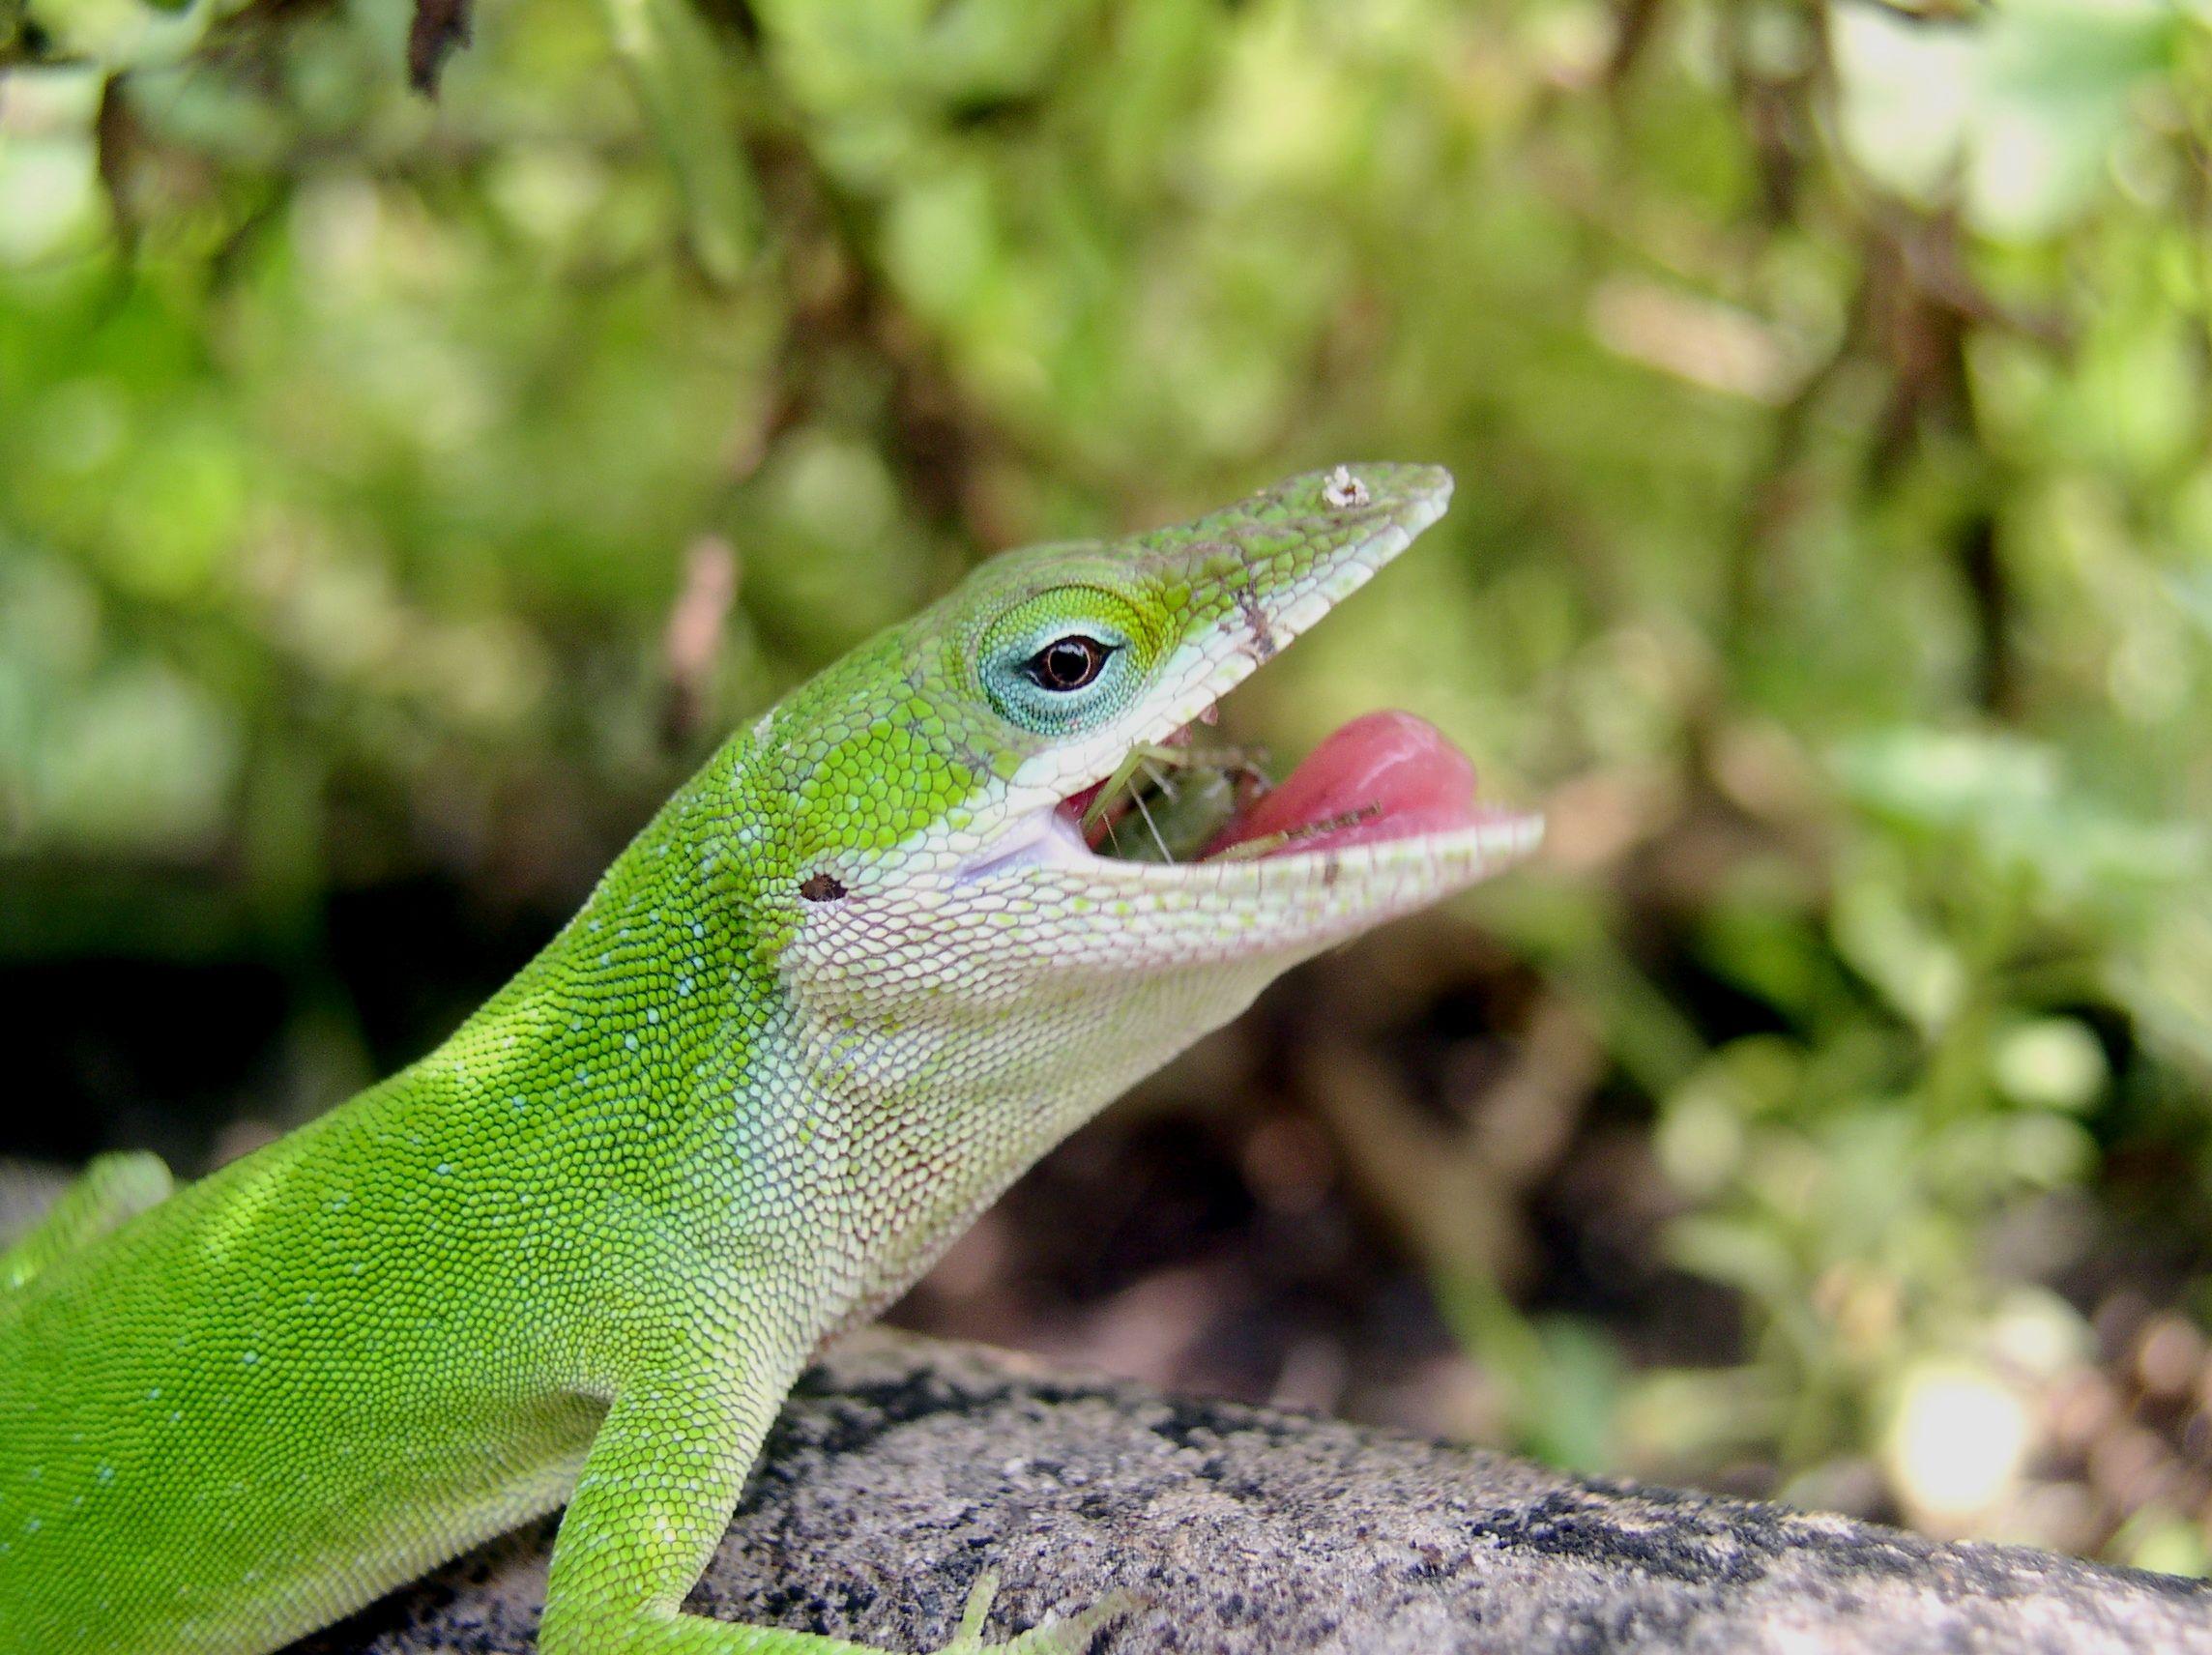 Eating 10397 Receitas Receta Recipe New Zealand Food Para Obtener Informacion Acceda A Nuestro Sitio Tourism Tour Lizard Anole Animals